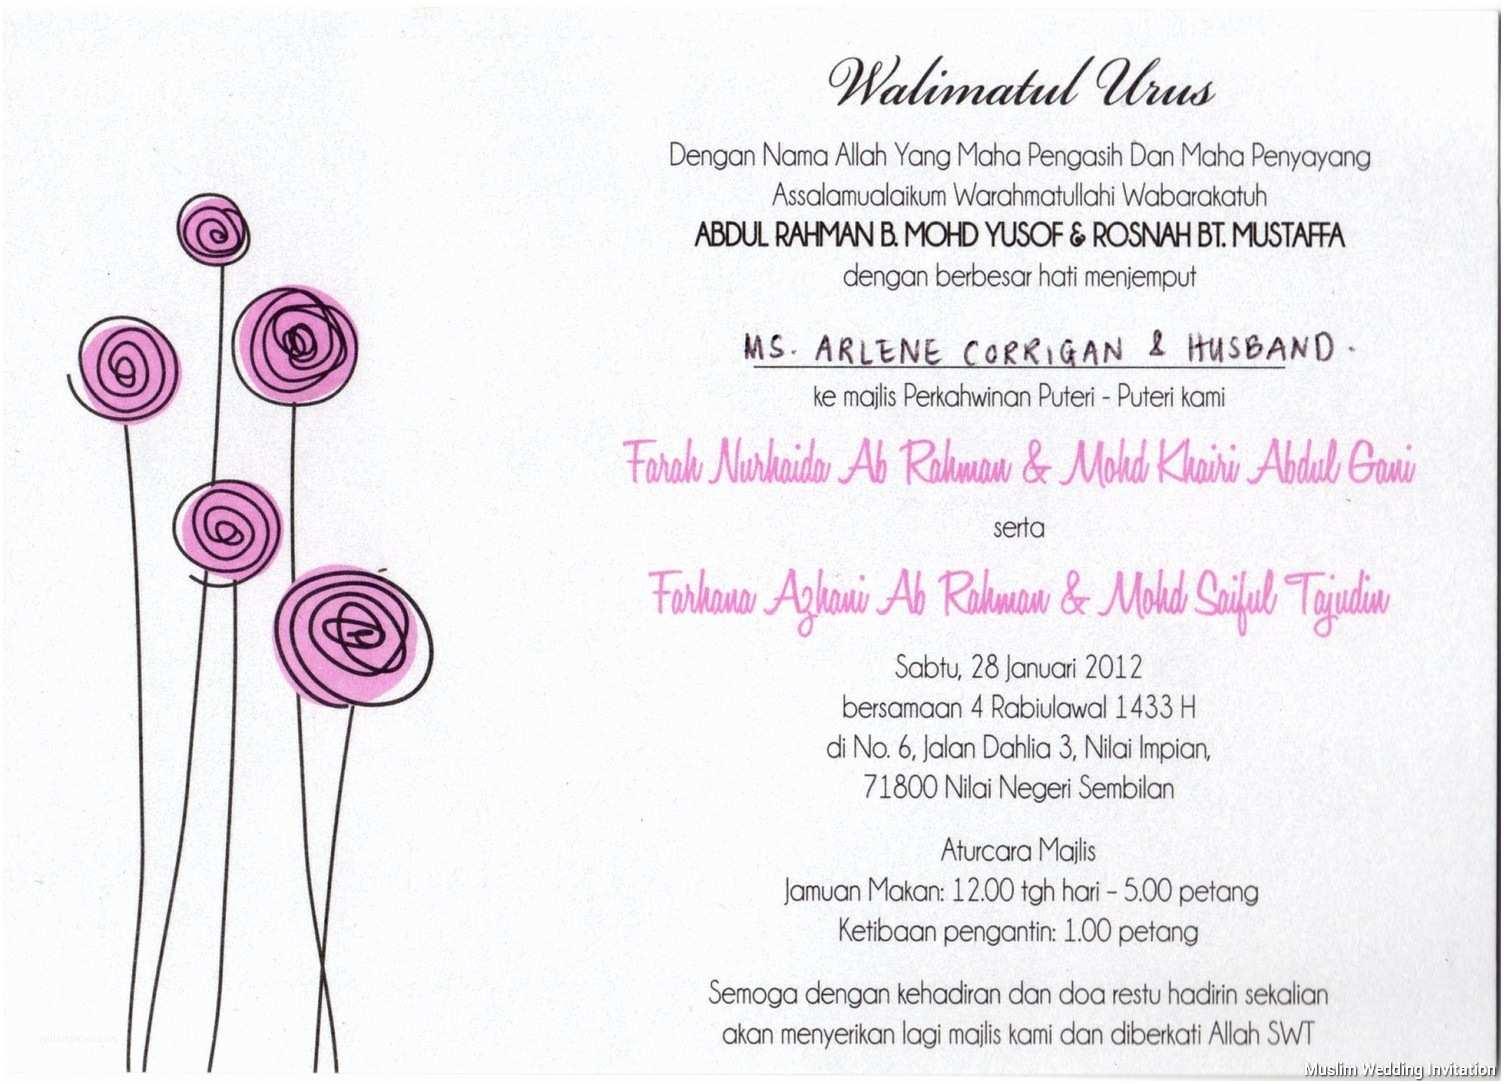 Muslim Wedding Invitations Wedding Invitation Templates and Wording